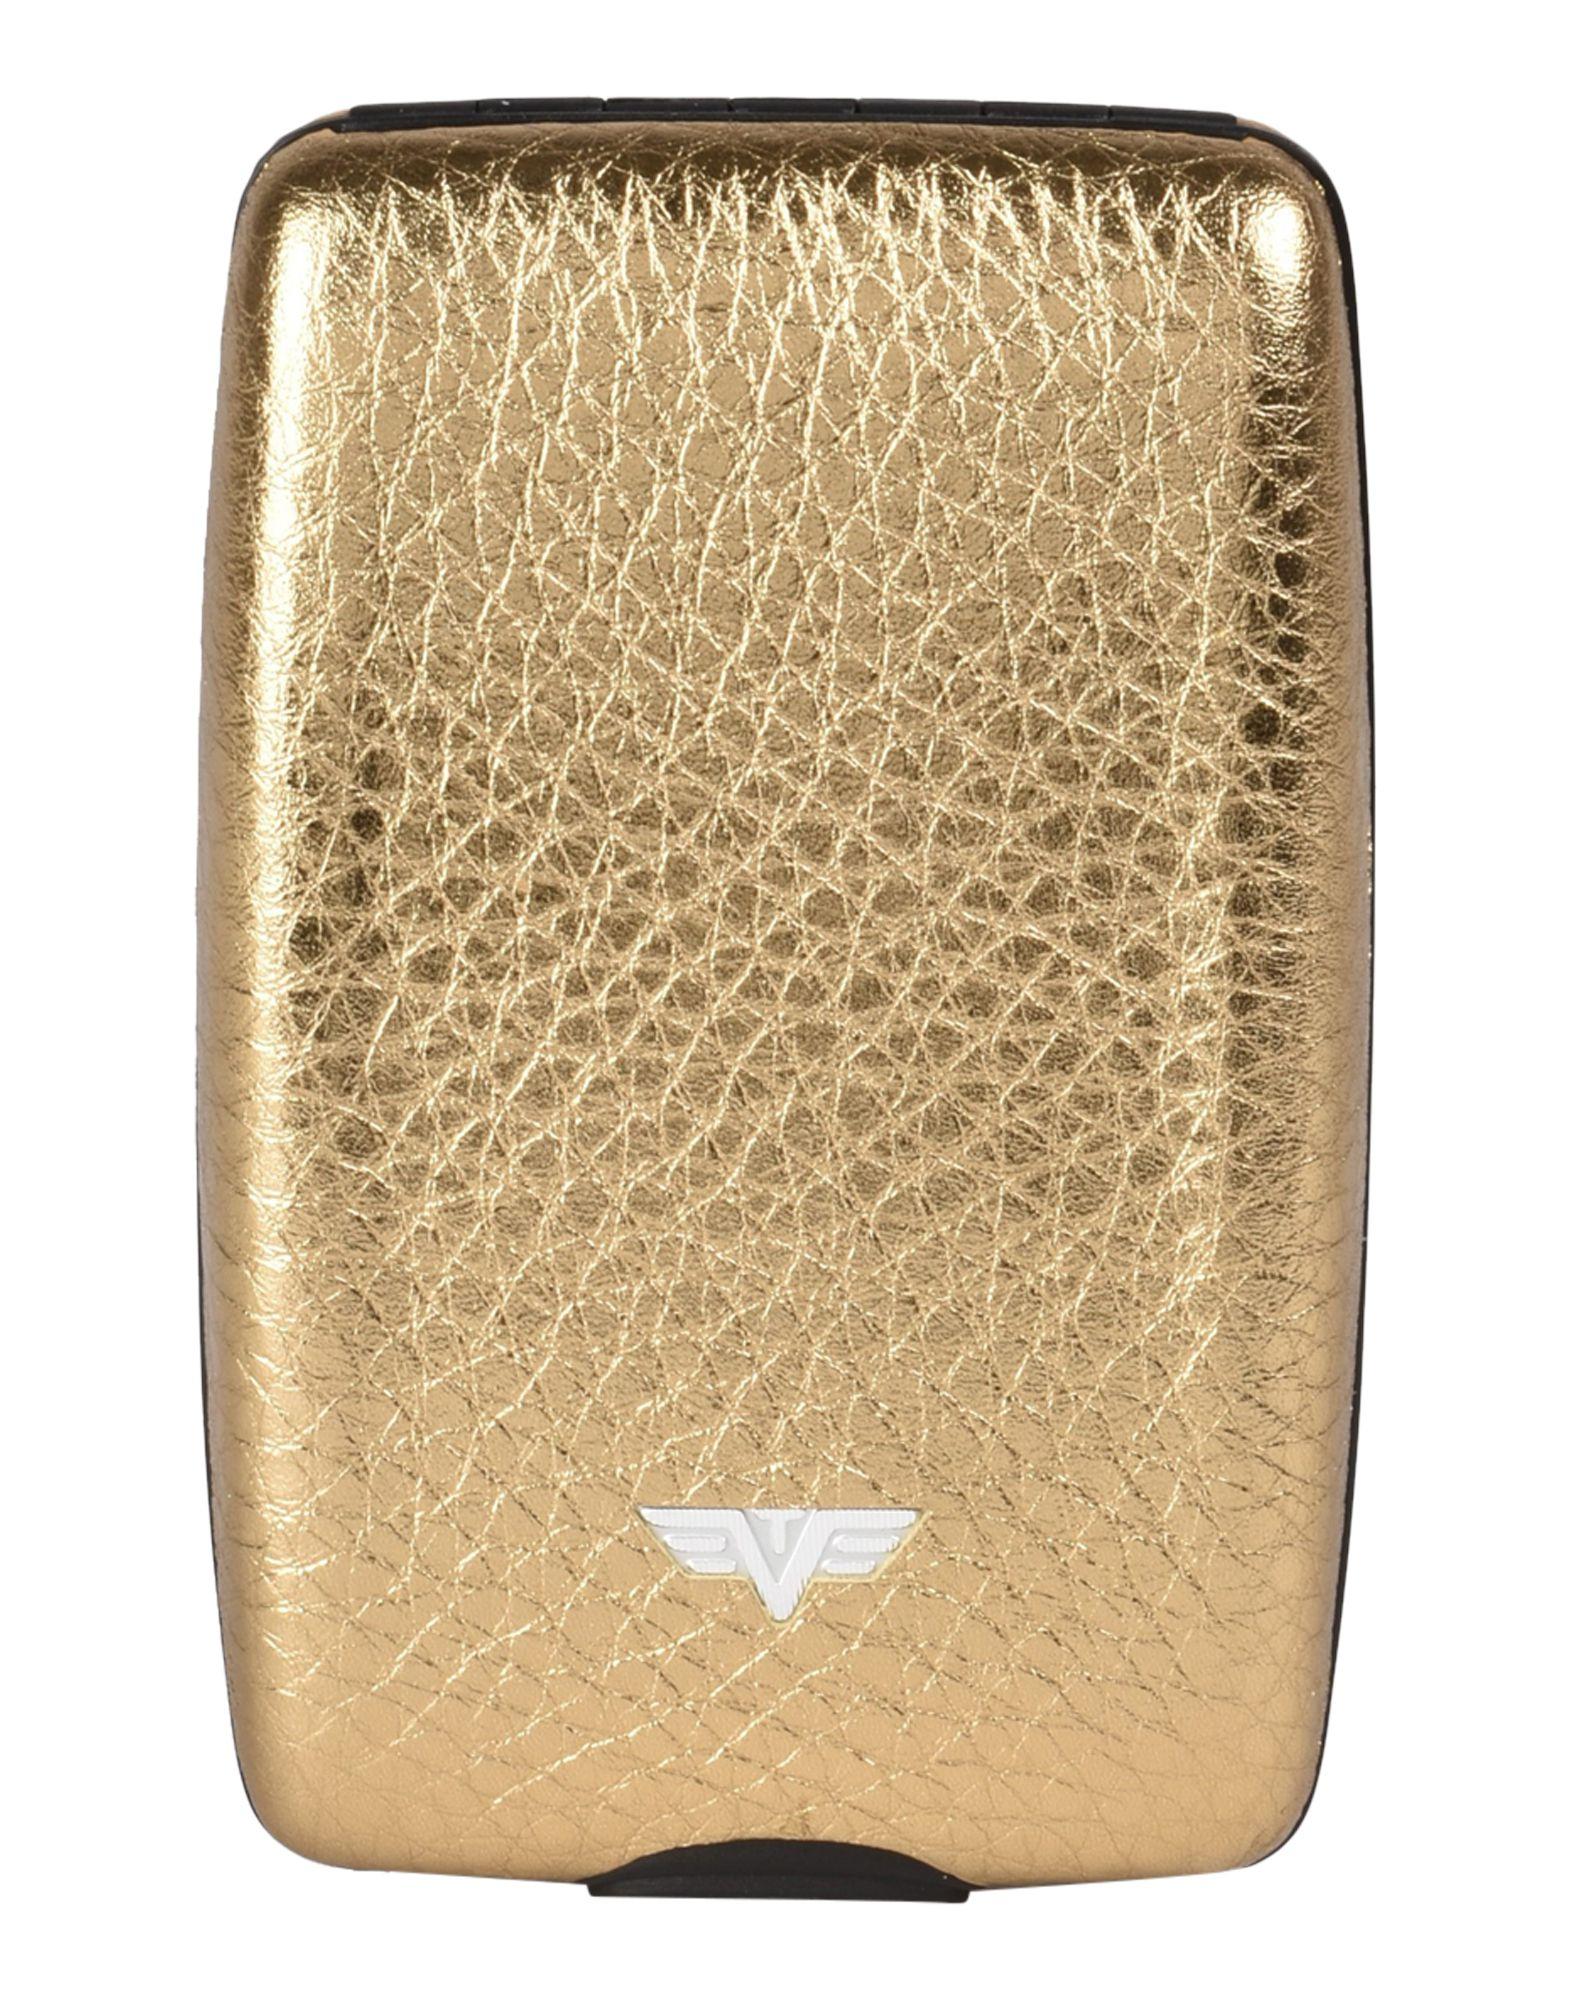 TRU VIRTU® Бумажник шнур для визитницы tru virtu черный